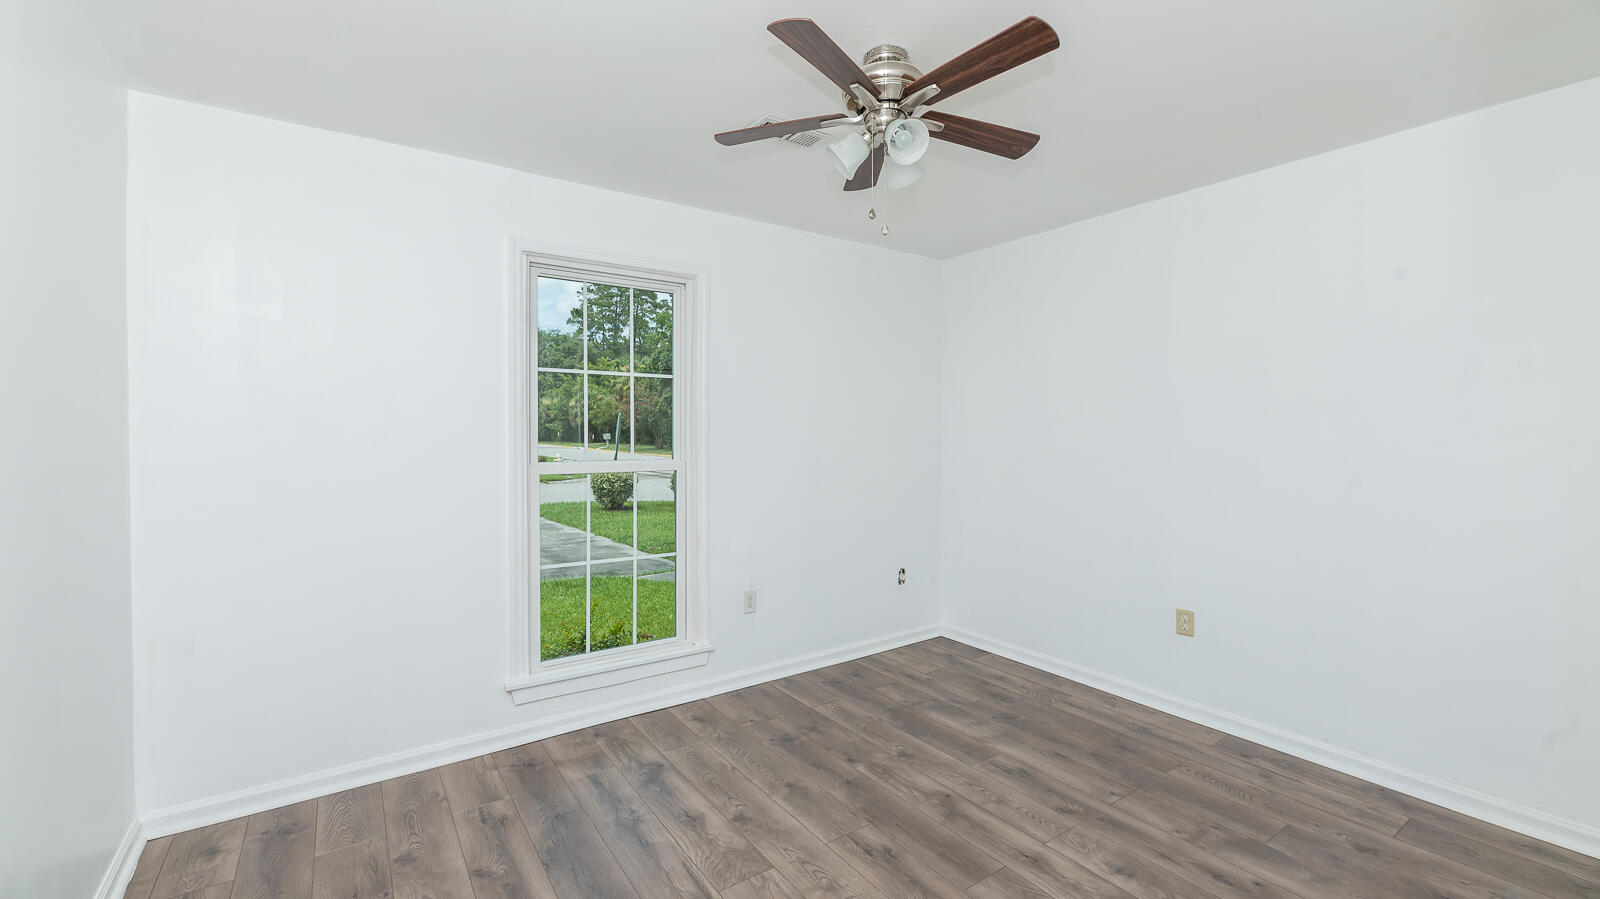 Ashley Villas Homes For Sale - 4315 Briarstone, North Charleston, SC - 31